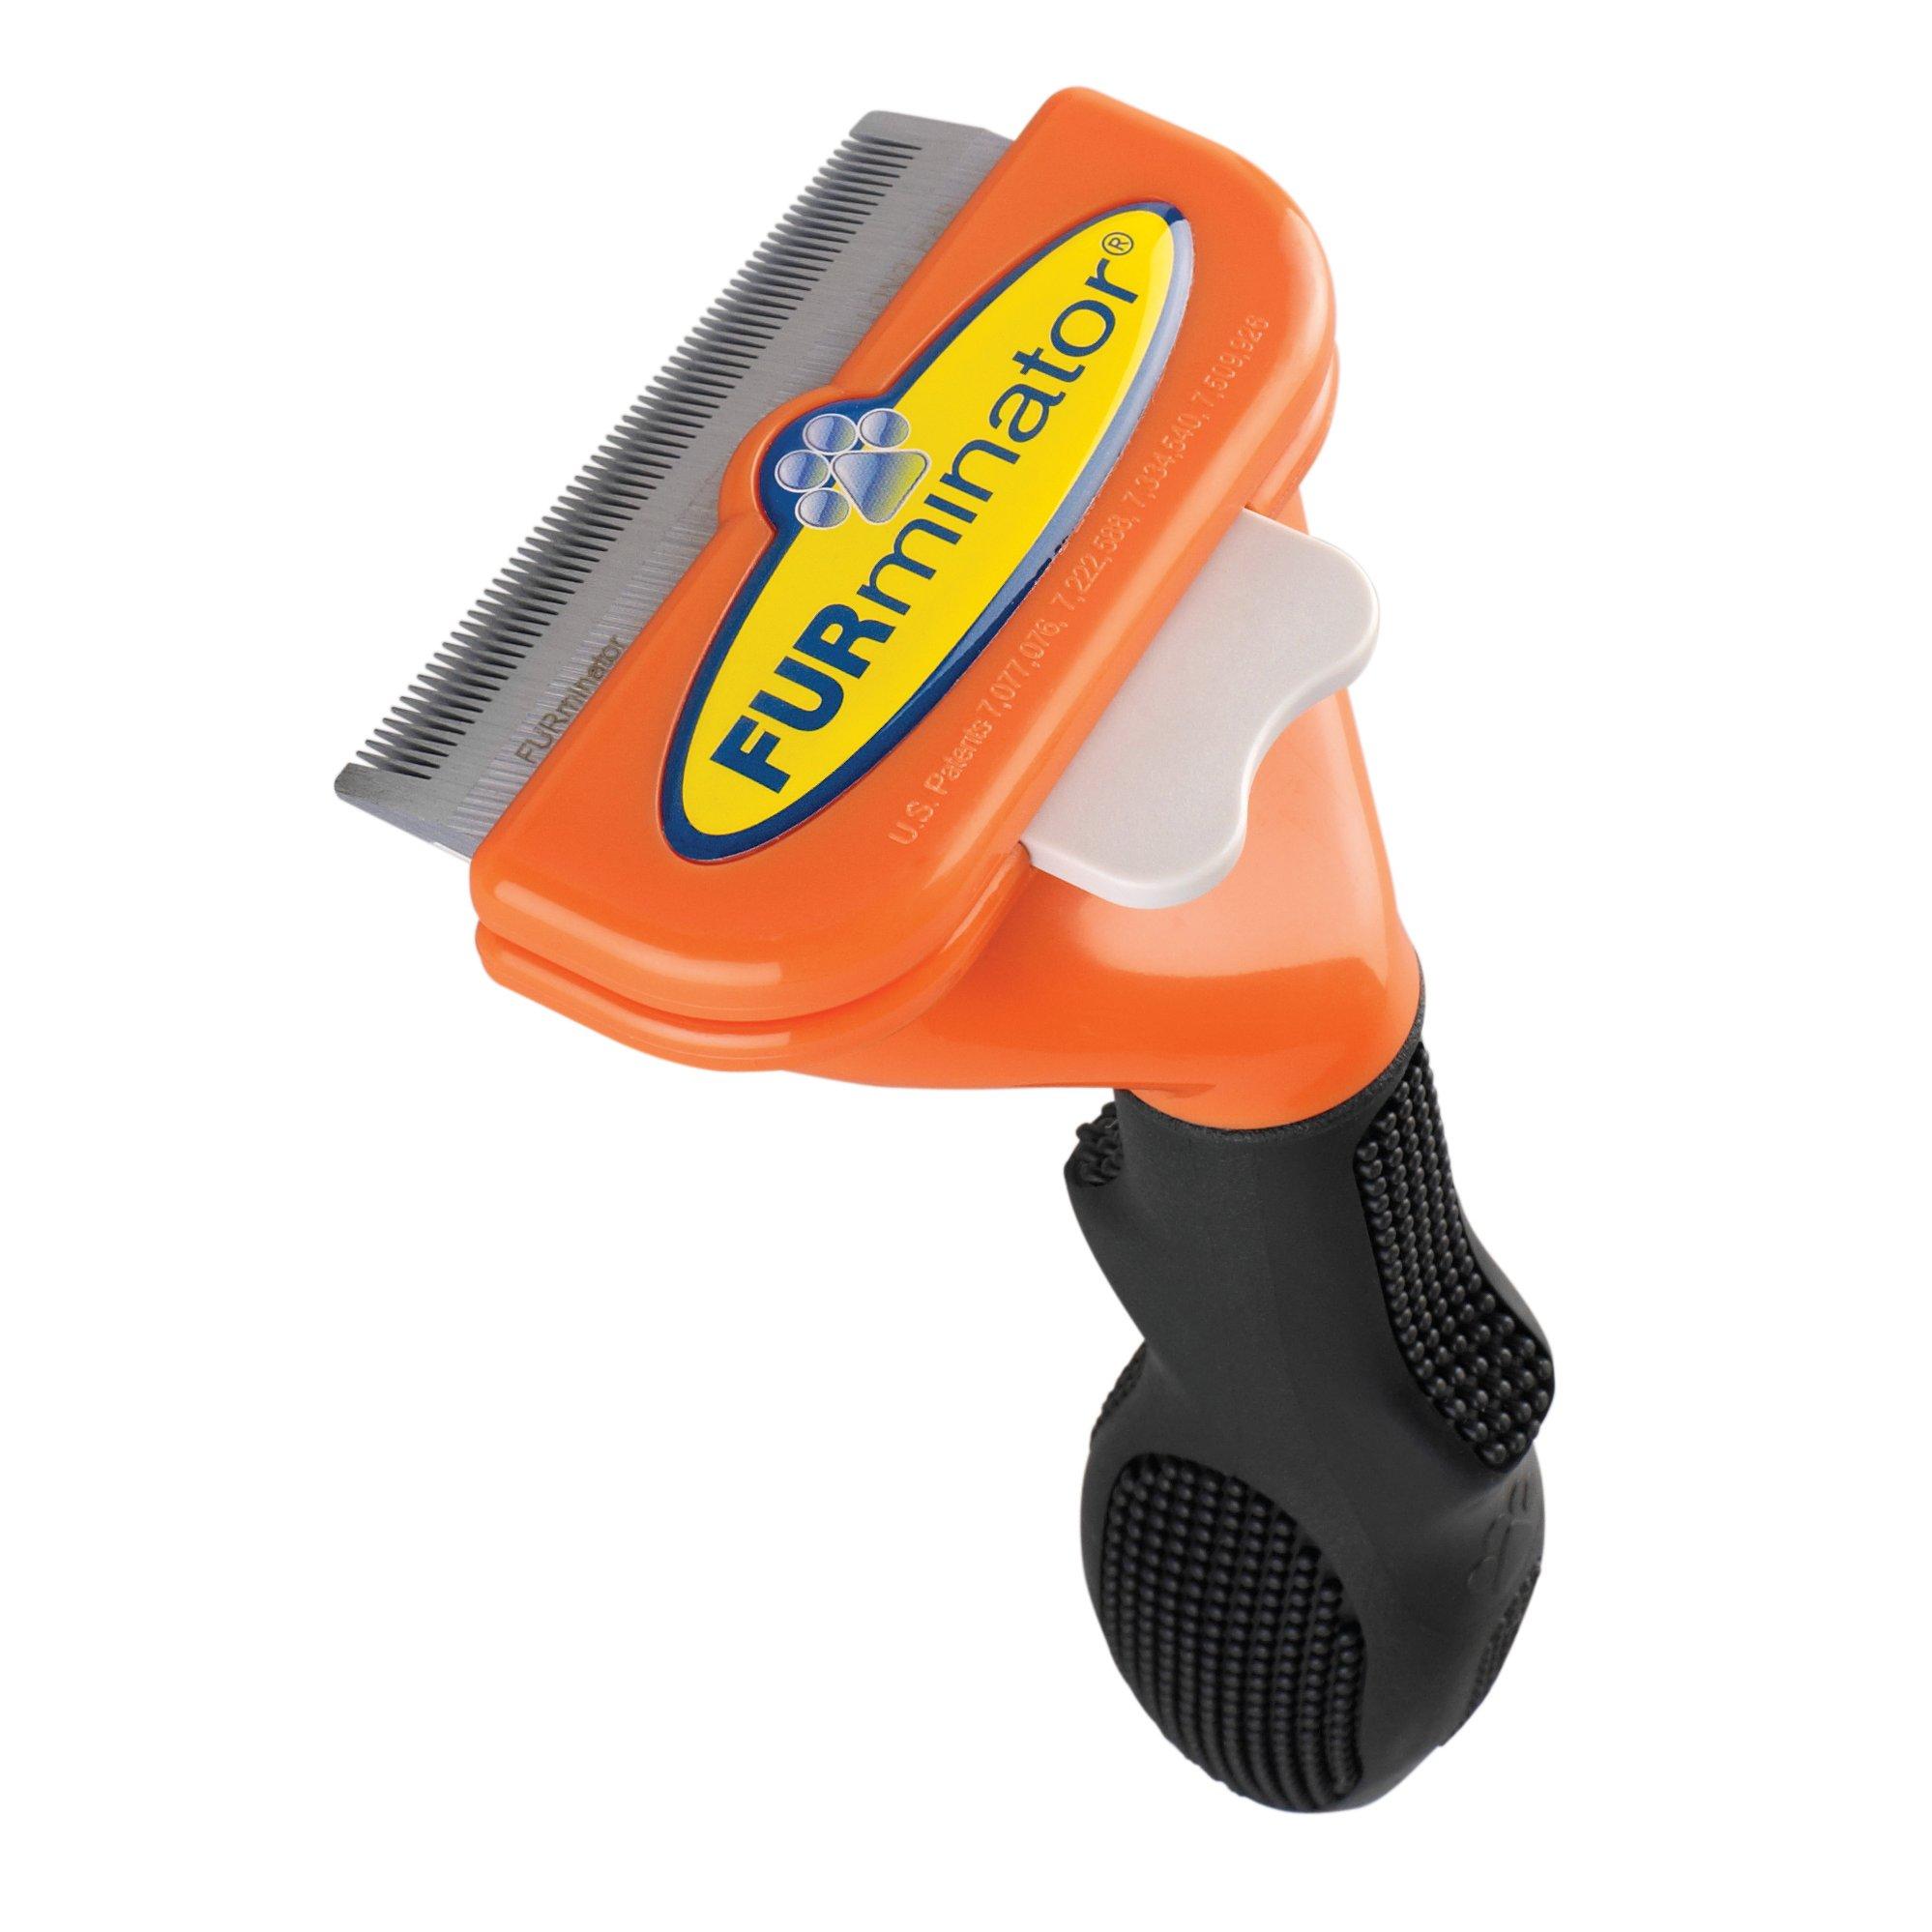 grooming self itm cleaning slicker brush pet shedding comb sheds professional dog